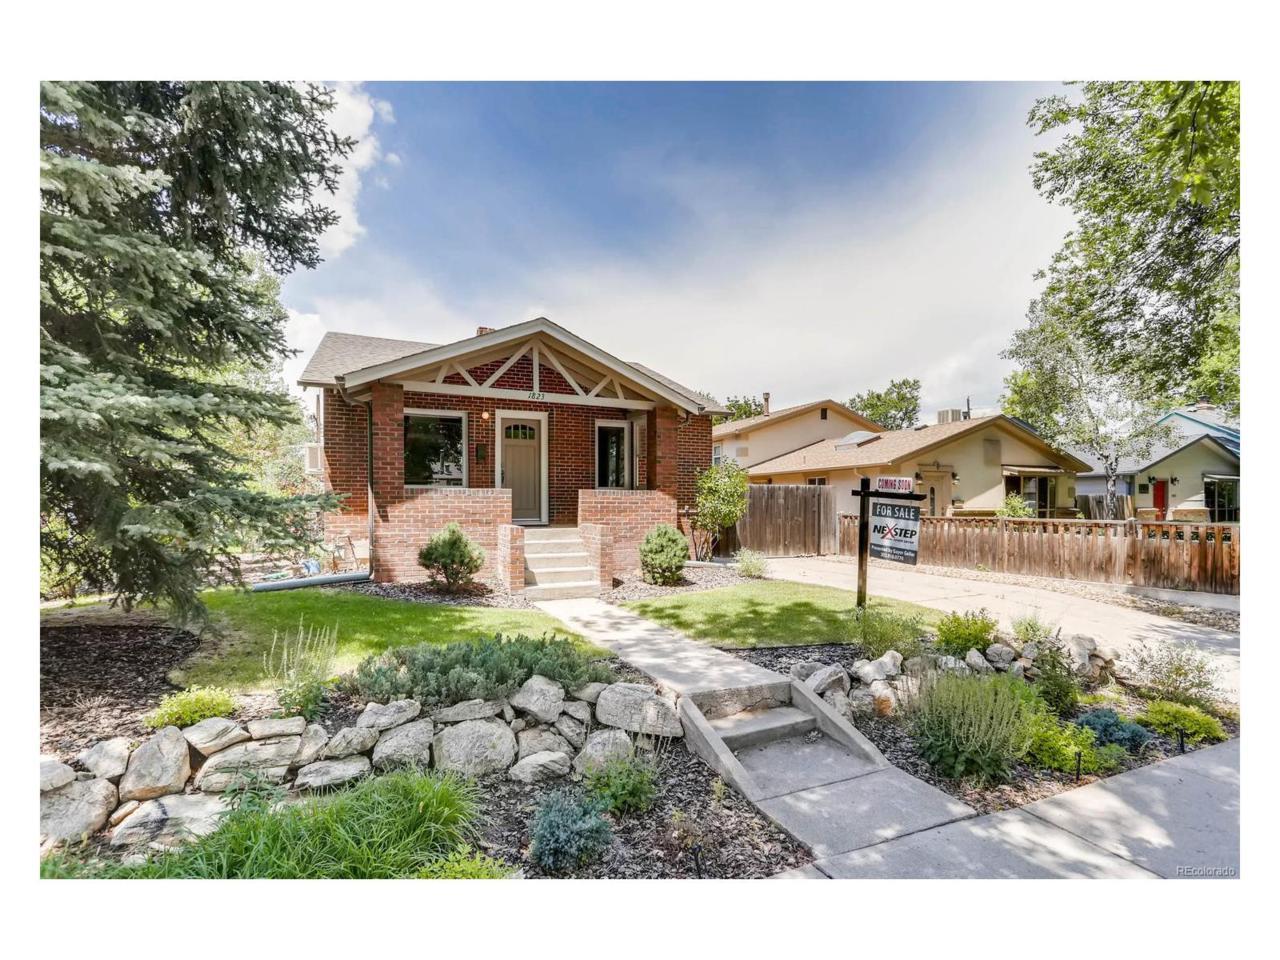 1823 S Downing Street, Denver, CO 80210 (MLS #6871069) :: 8z Real Estate